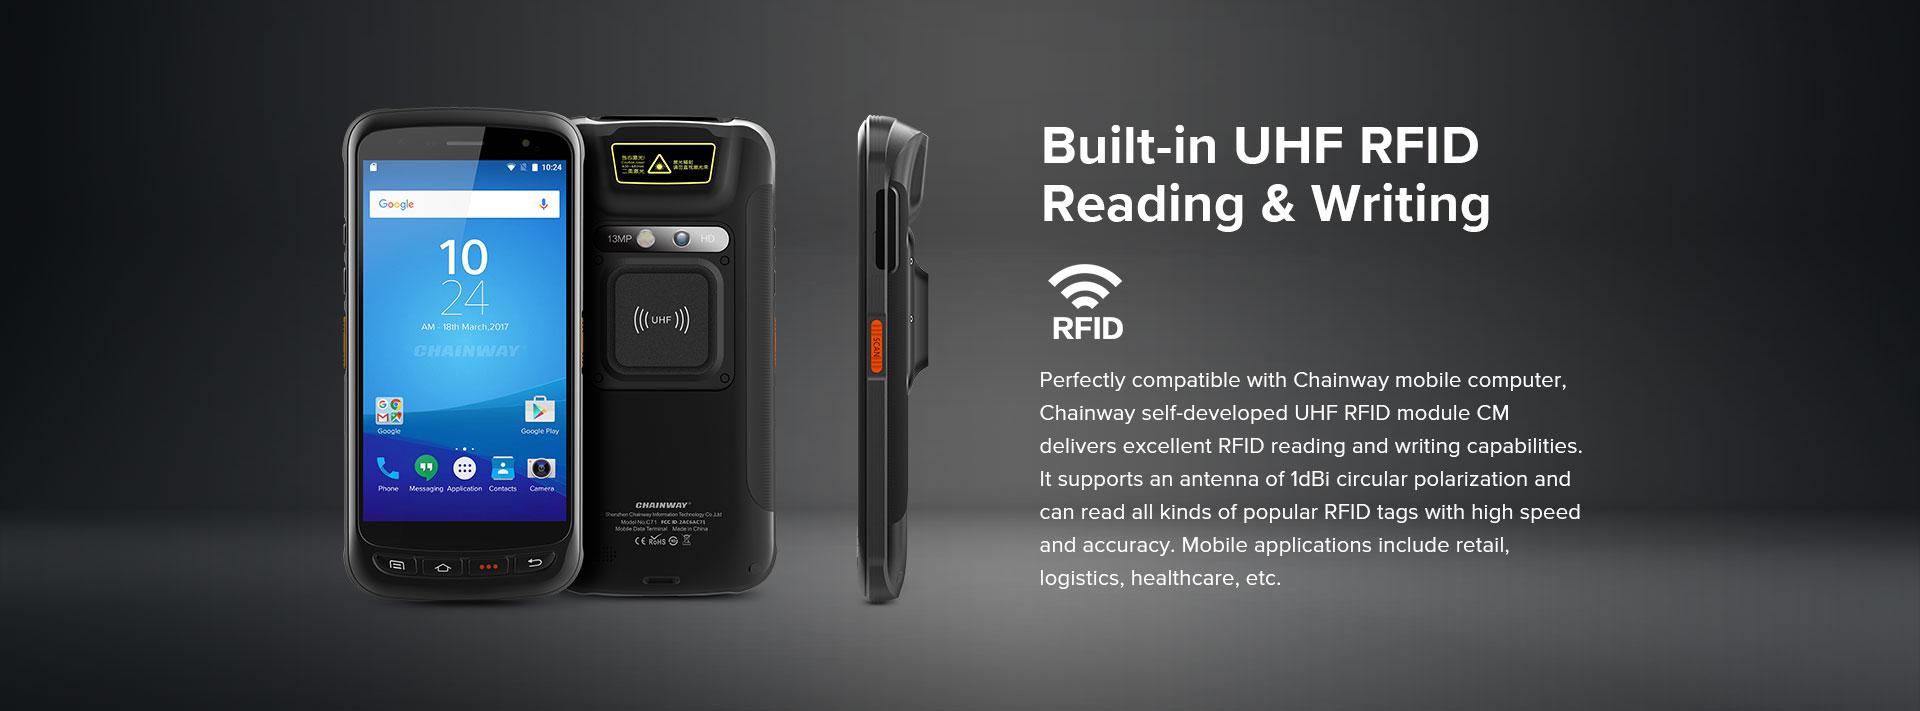 C71 - Android Industrial Mobile Computer RFID UHF antenna integrata